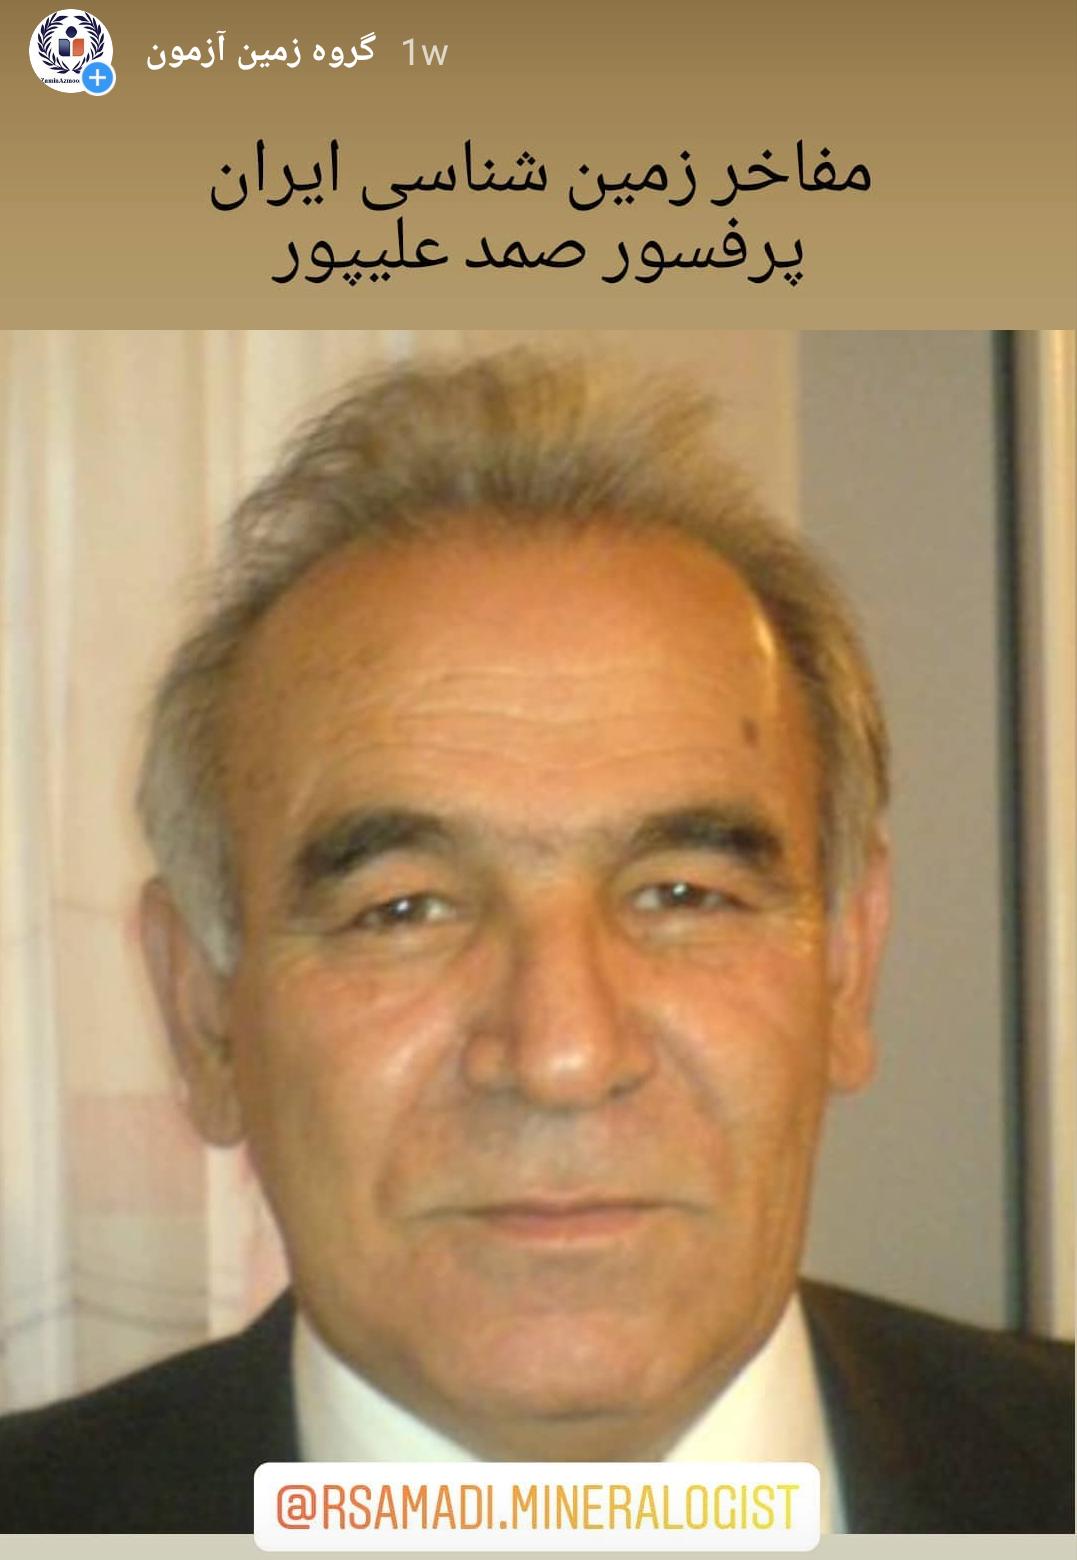 دکتر صمد علیپور